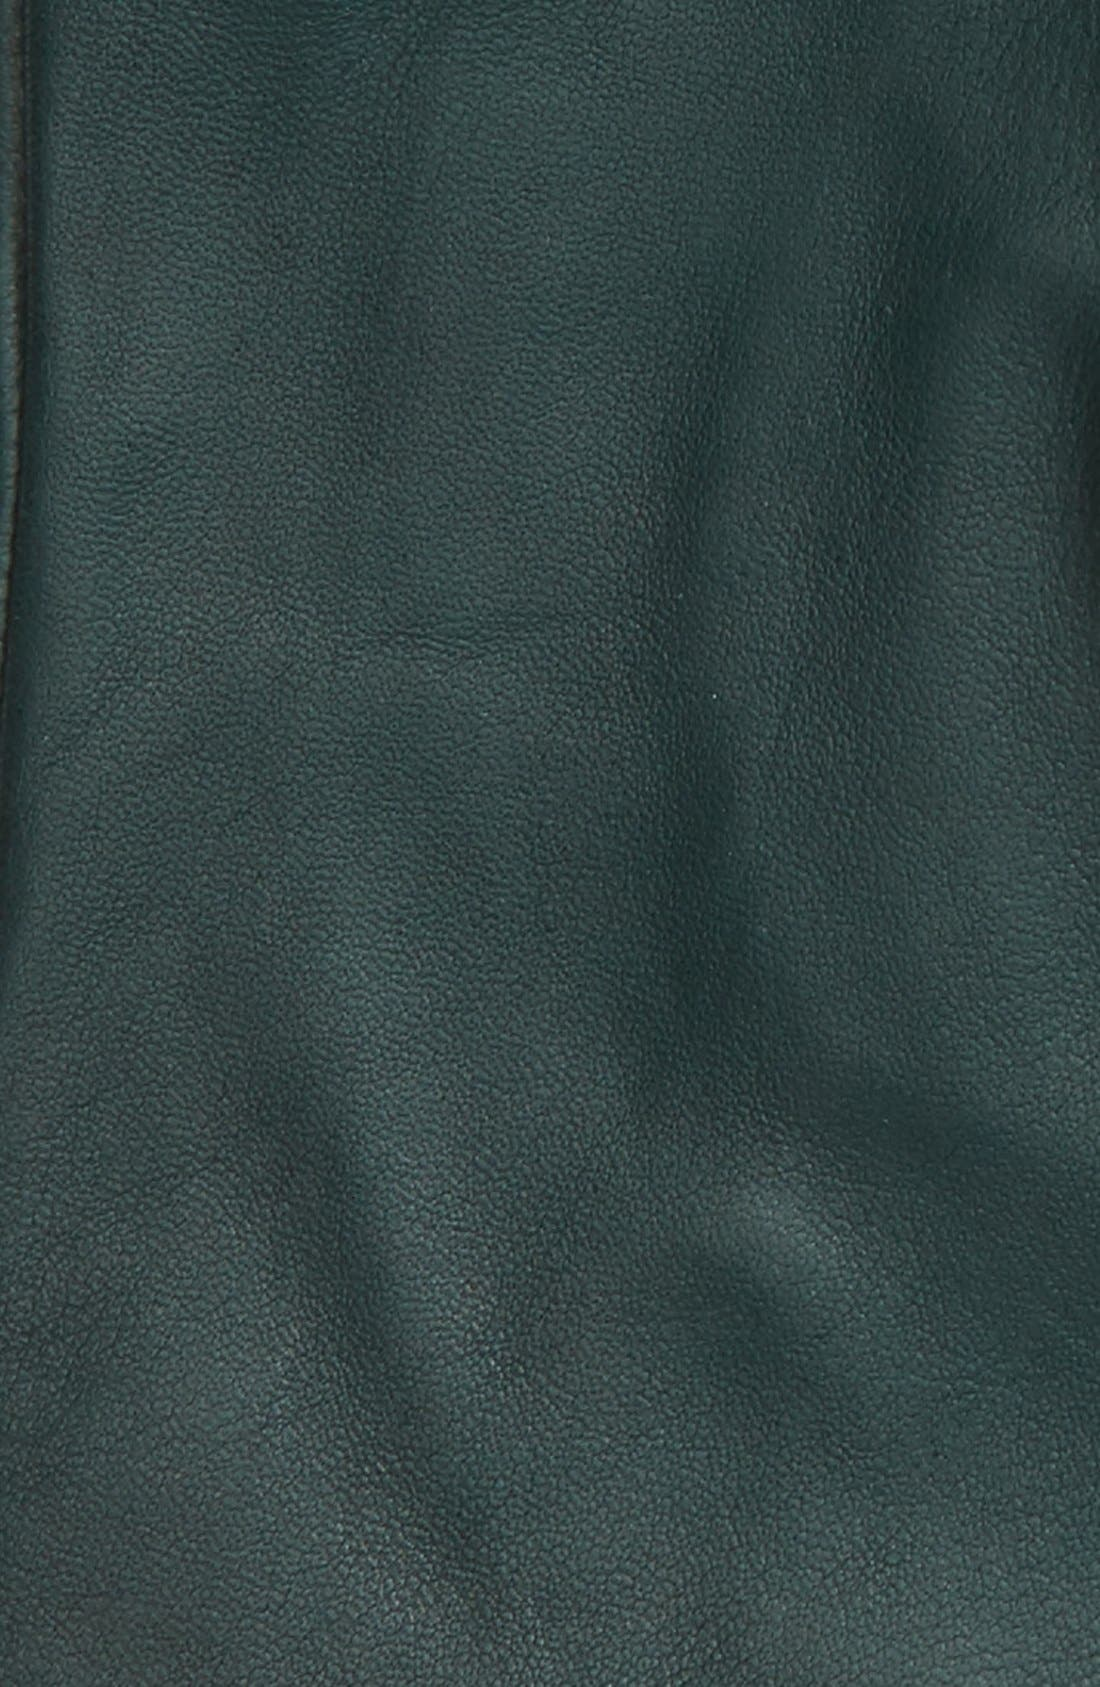 Short Leather Gloves,                             Alternate thumbnail 10, color,